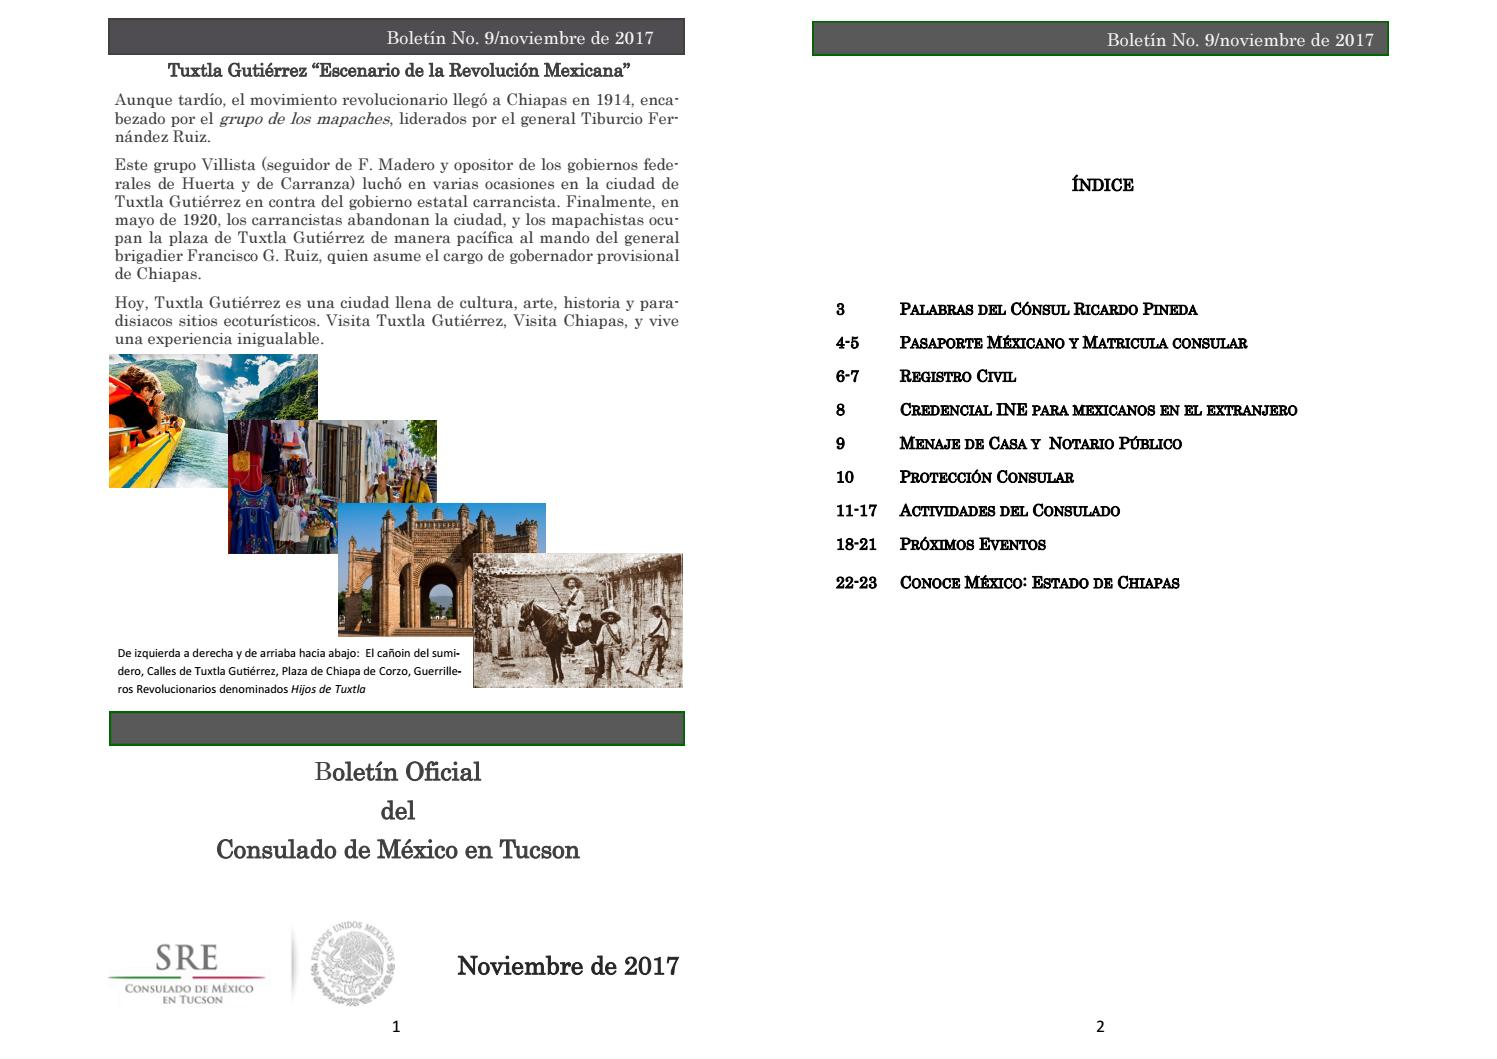 Boletín Oficial del Consulado de México en Tucson No  8/noviembre de 2017